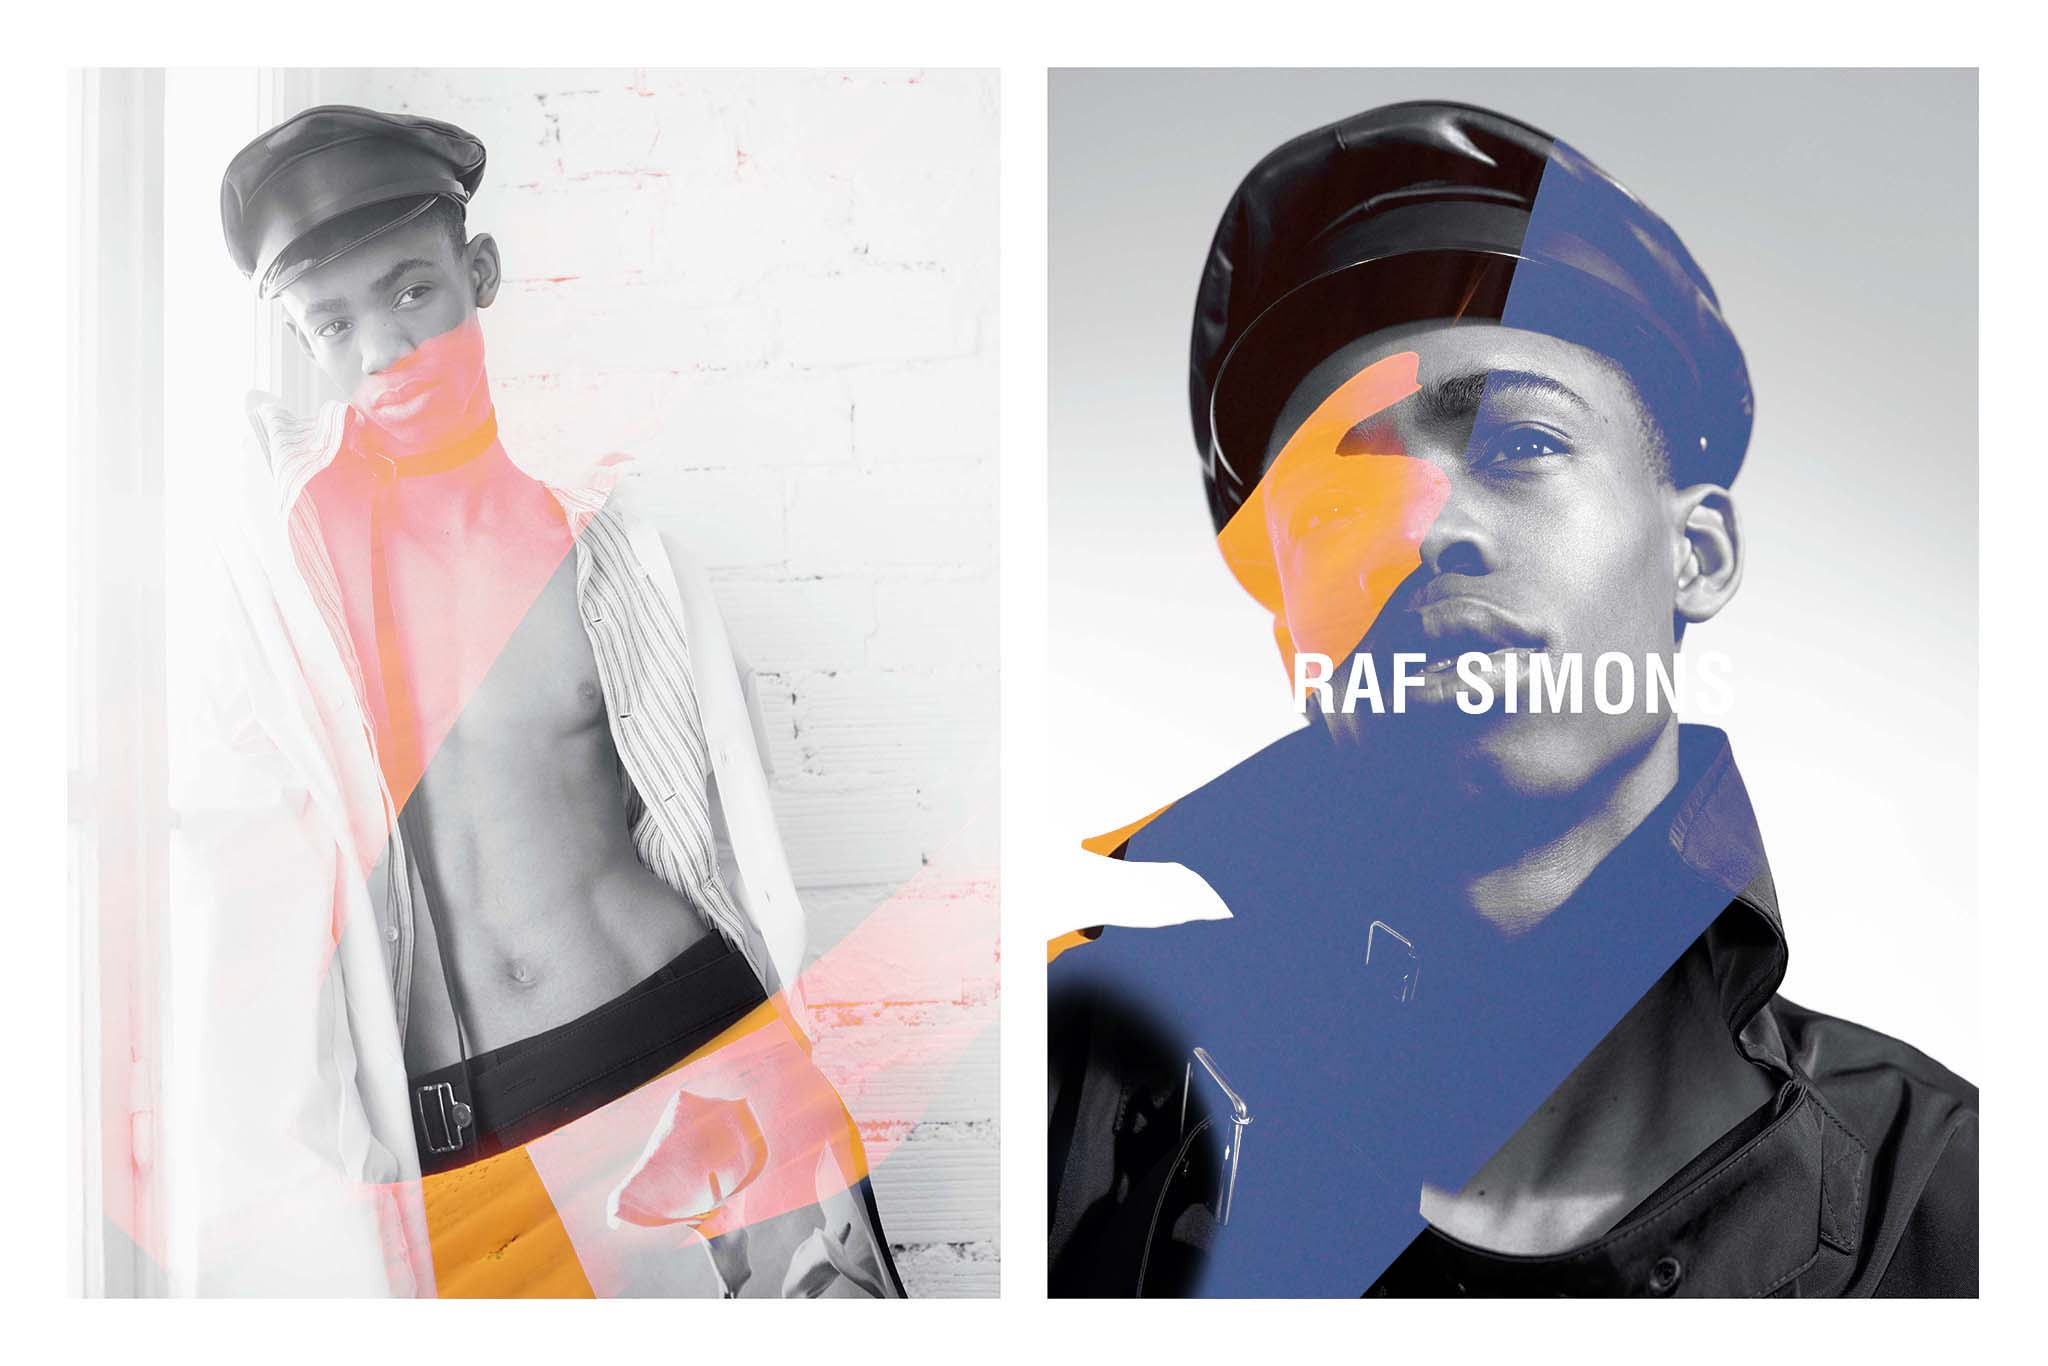 RAF SIMMONS 2.3.jpg